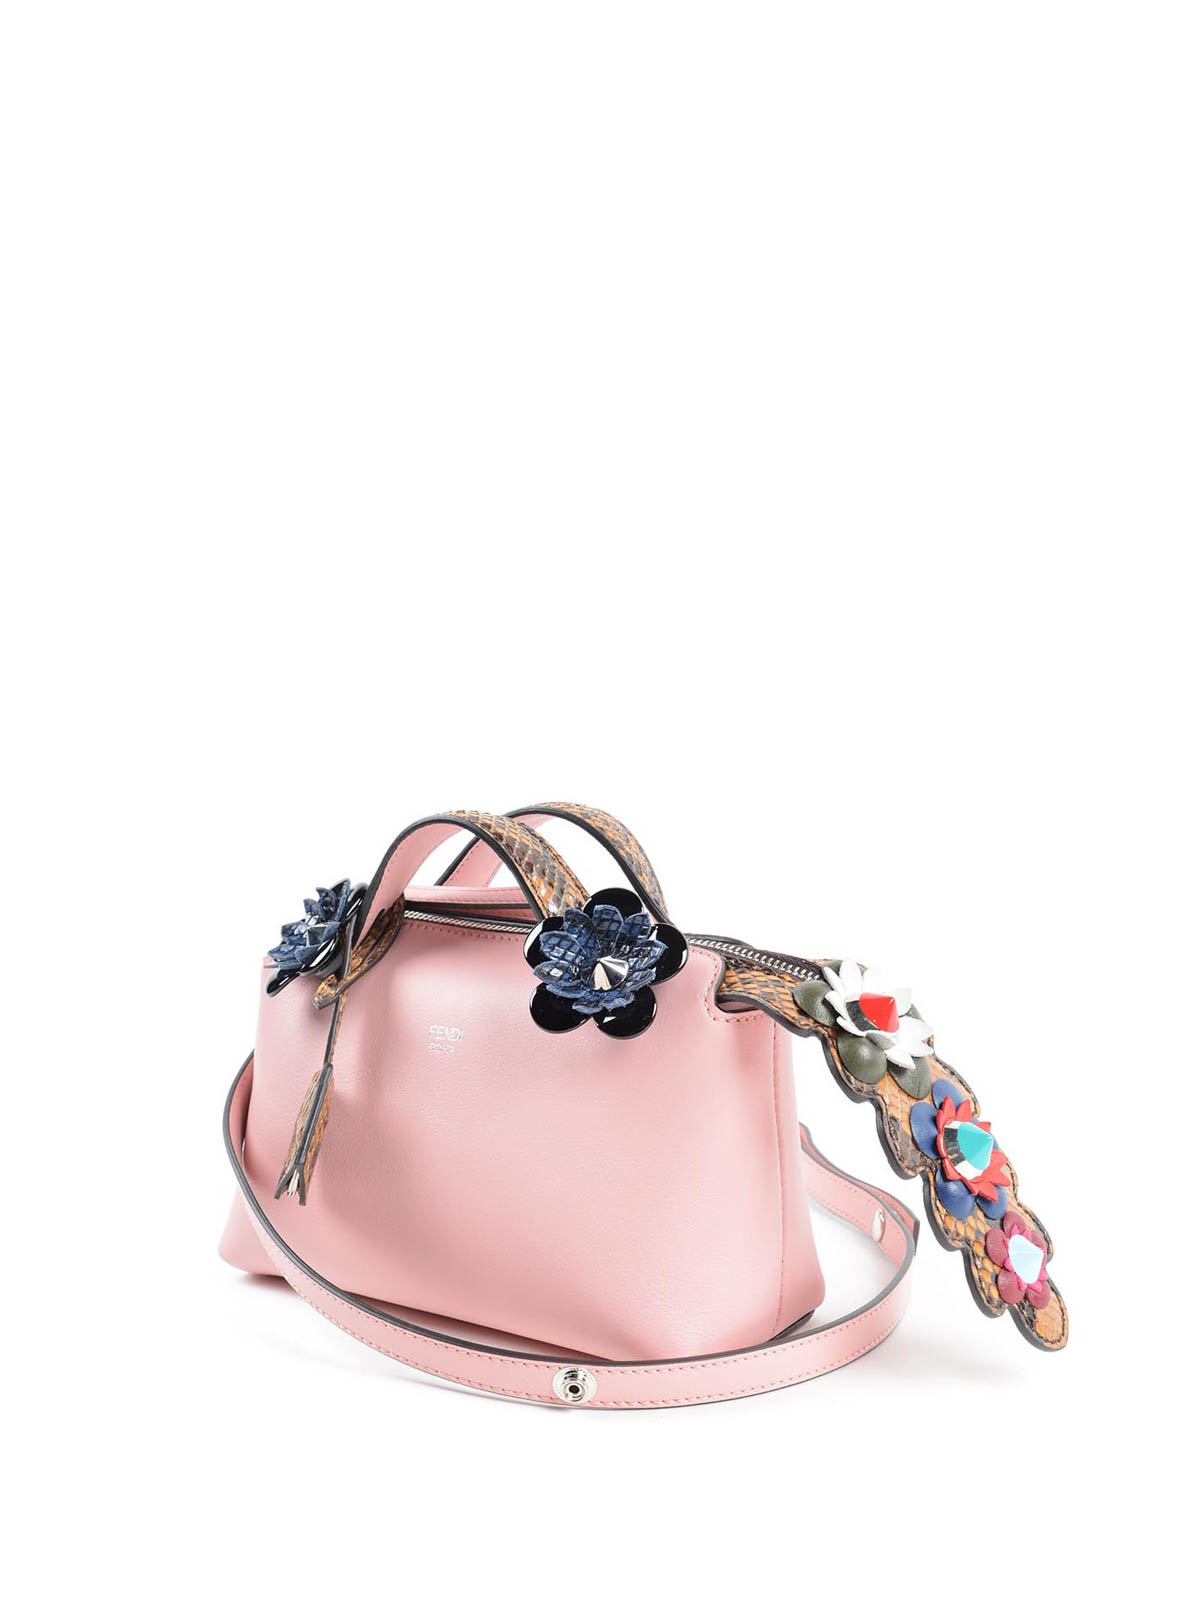 2ddd8b256668 Fendi - By The Way mini bag with flowers - bowling bags - 8BL135.7VX 2KT